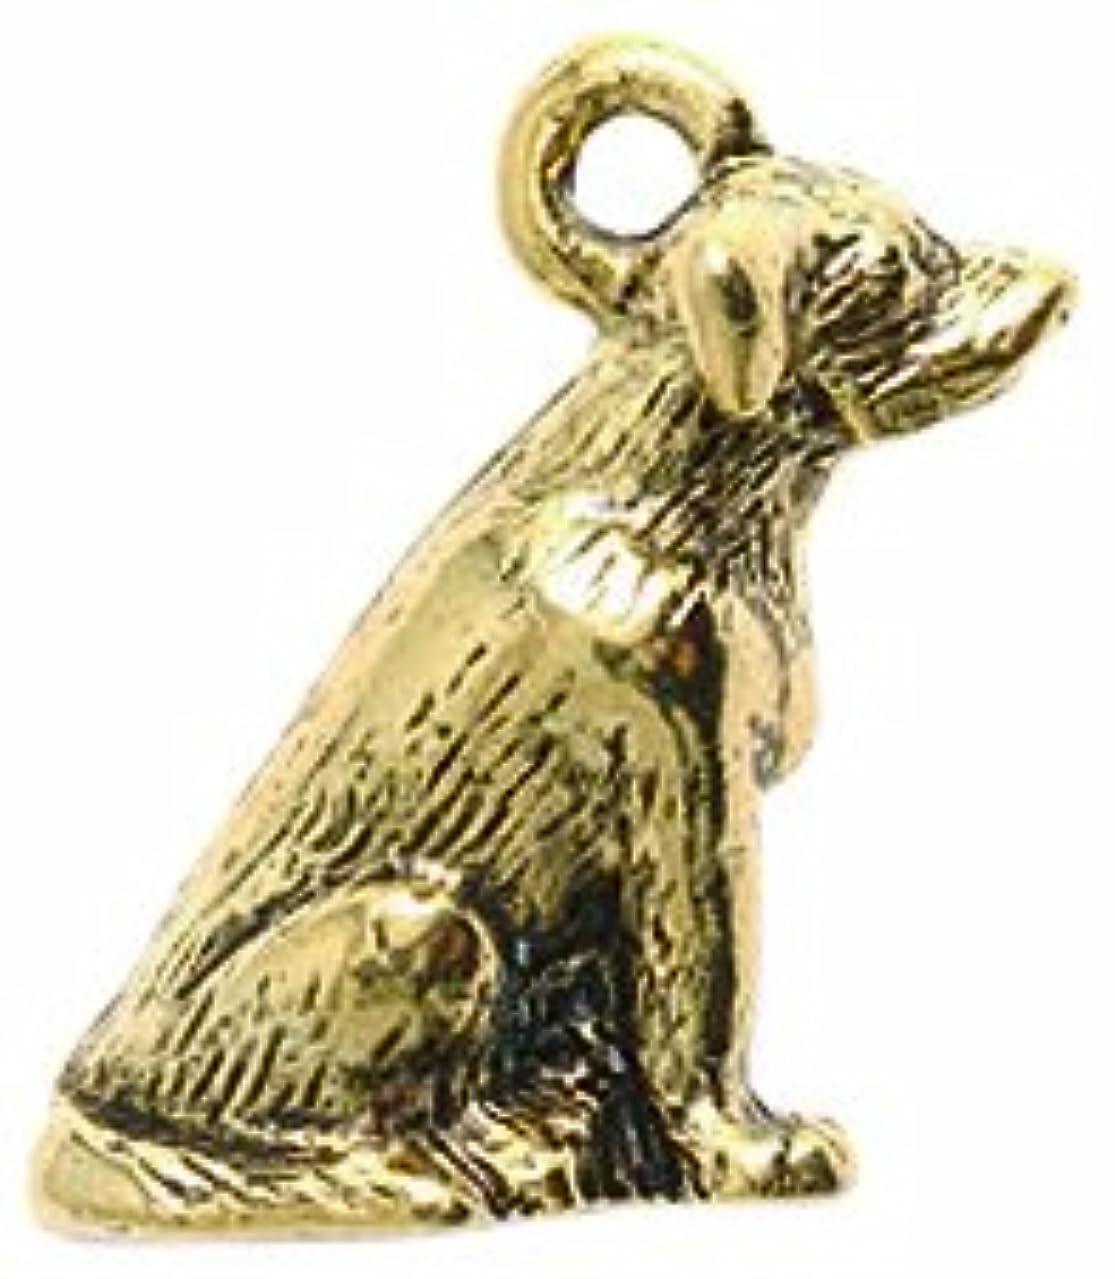 Shipwreck Beads Pewter Labrador Dog Charm, Antique Gold, 18mm, 2-Piece